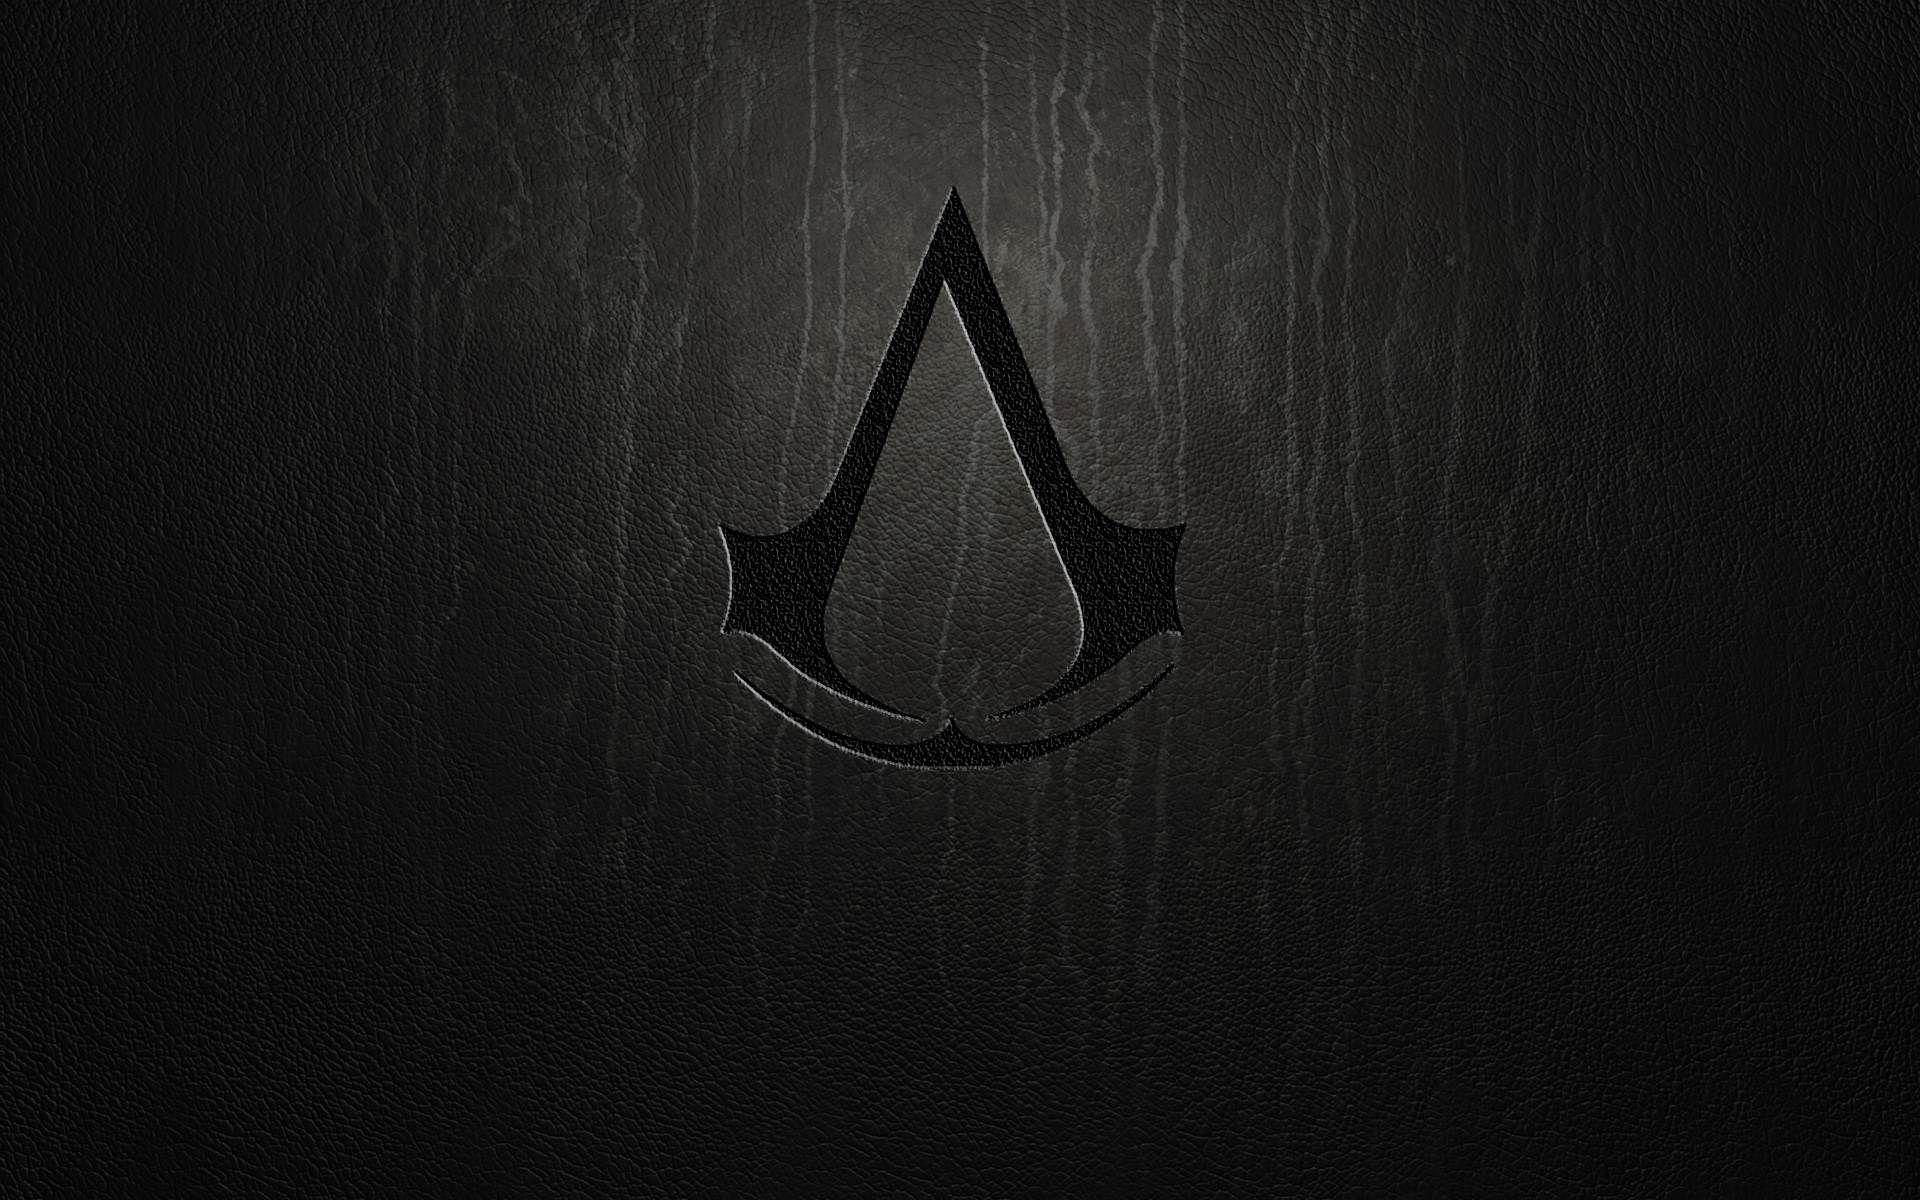 Assassins Creed Hd Wallpapers Wallpaper 1920 1200 Assassins Wallpapers Adorable Wallpaper Assassin S Creed Wallpaper Assassin S Creed Black Assassins Creed